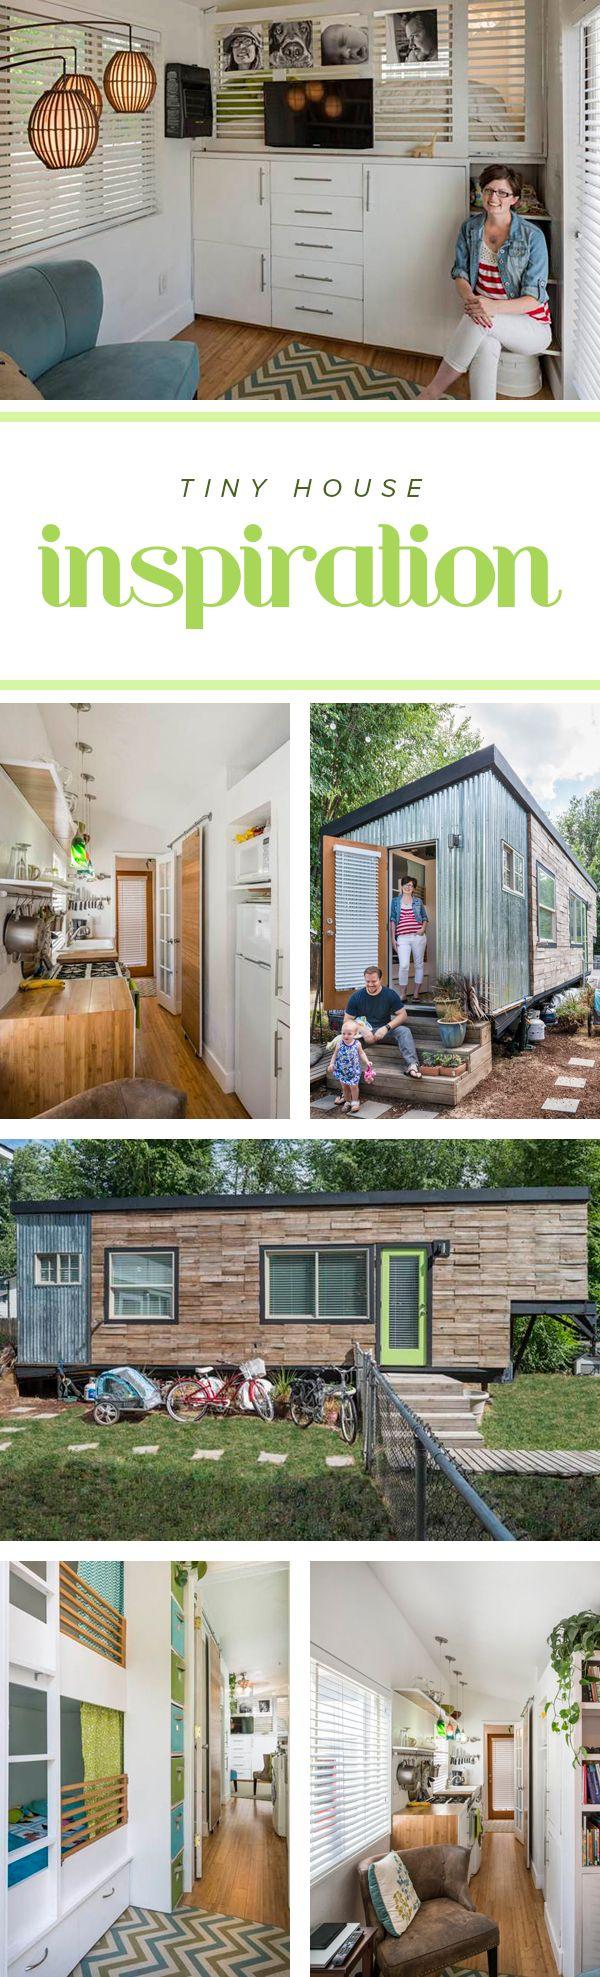 best 25  inside tiny houses ideas on pinterest